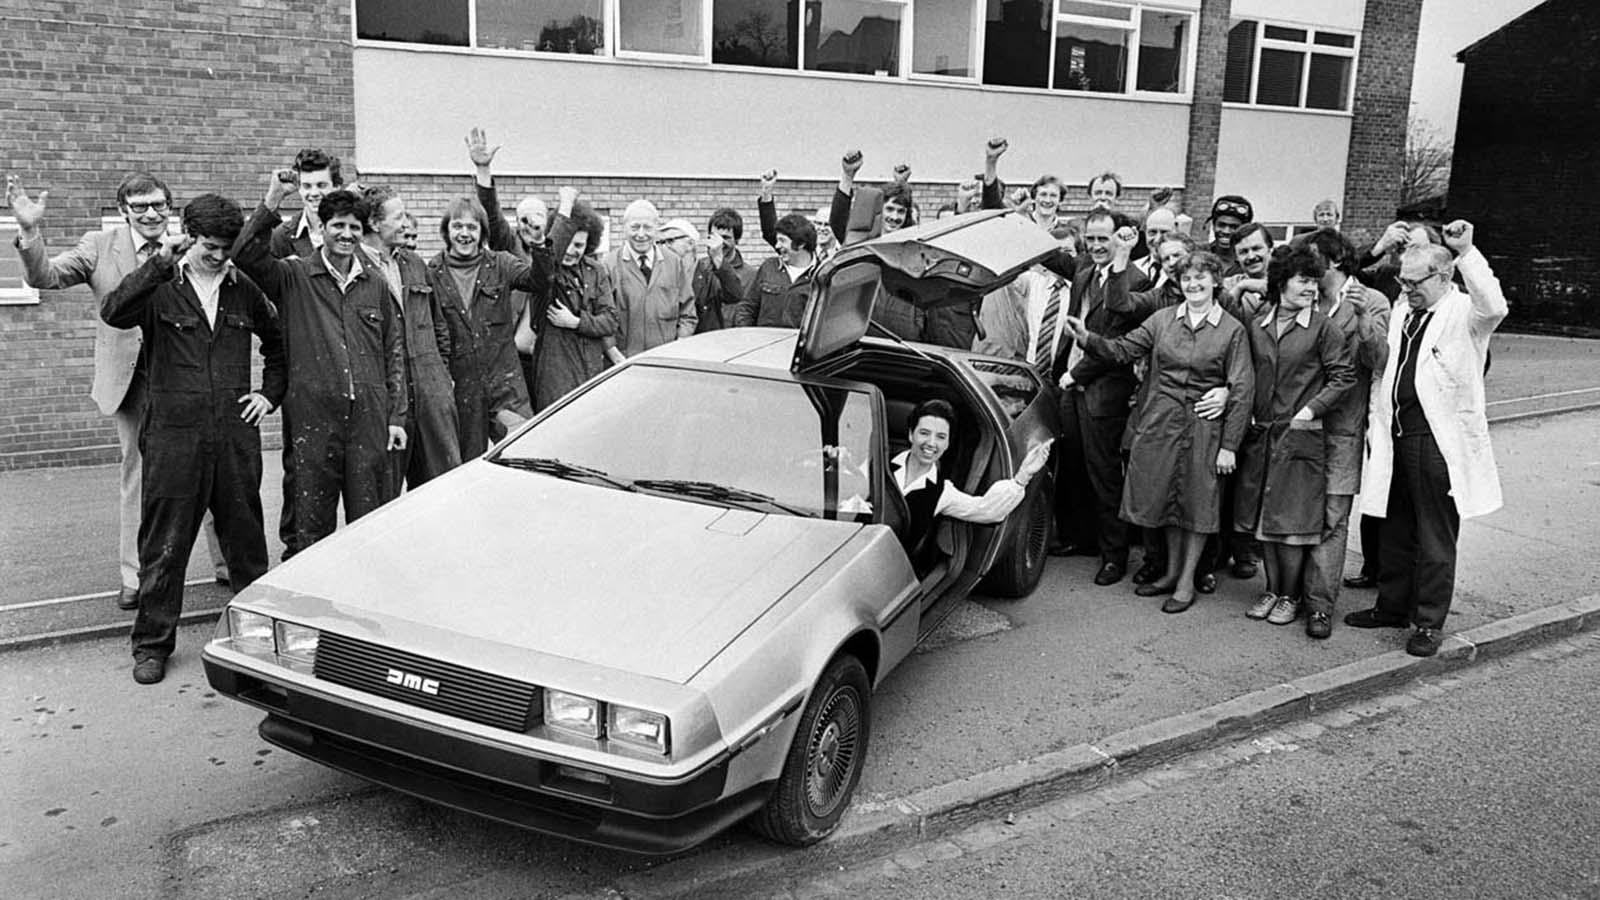 A DeLorean outside a company office. 1981.